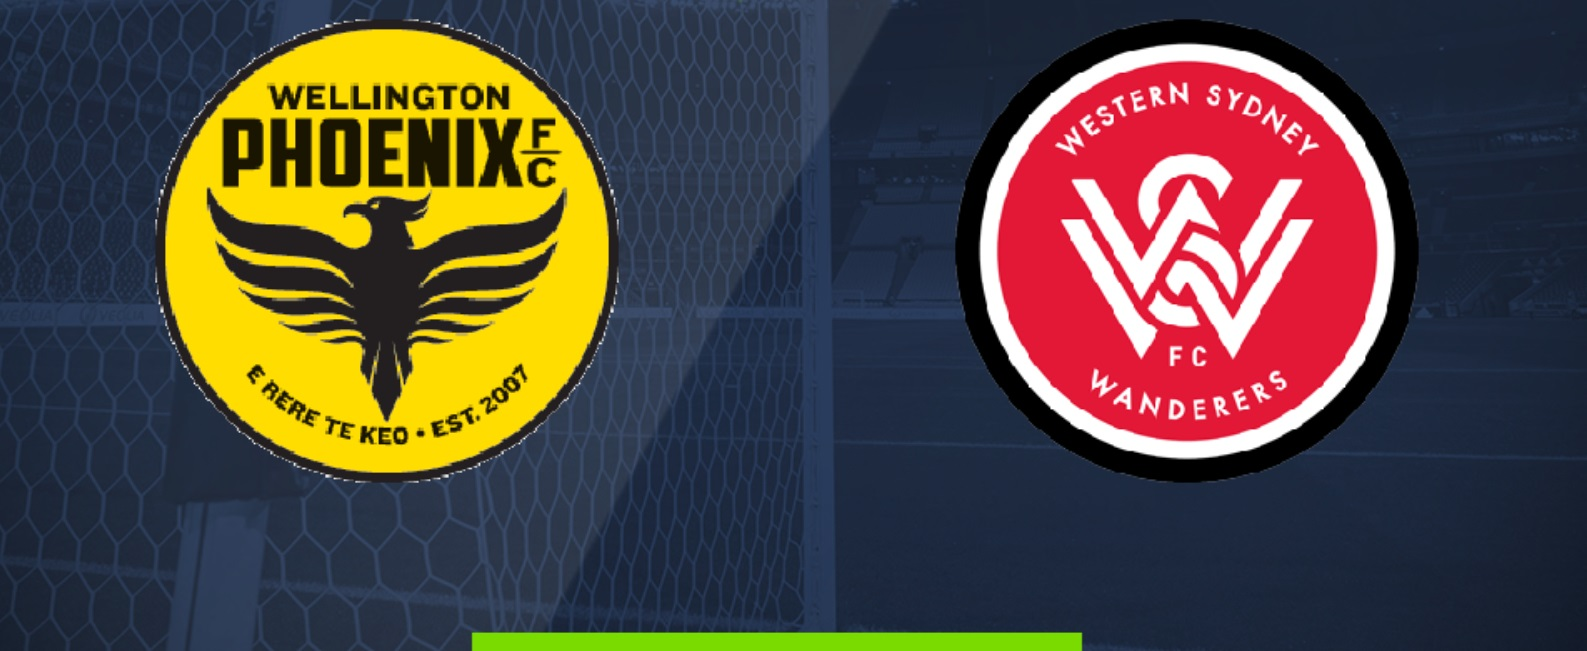 tip-keo-bong-da-ngay-08-01-2020-wellington-phoenix-vs-western-sydney-1